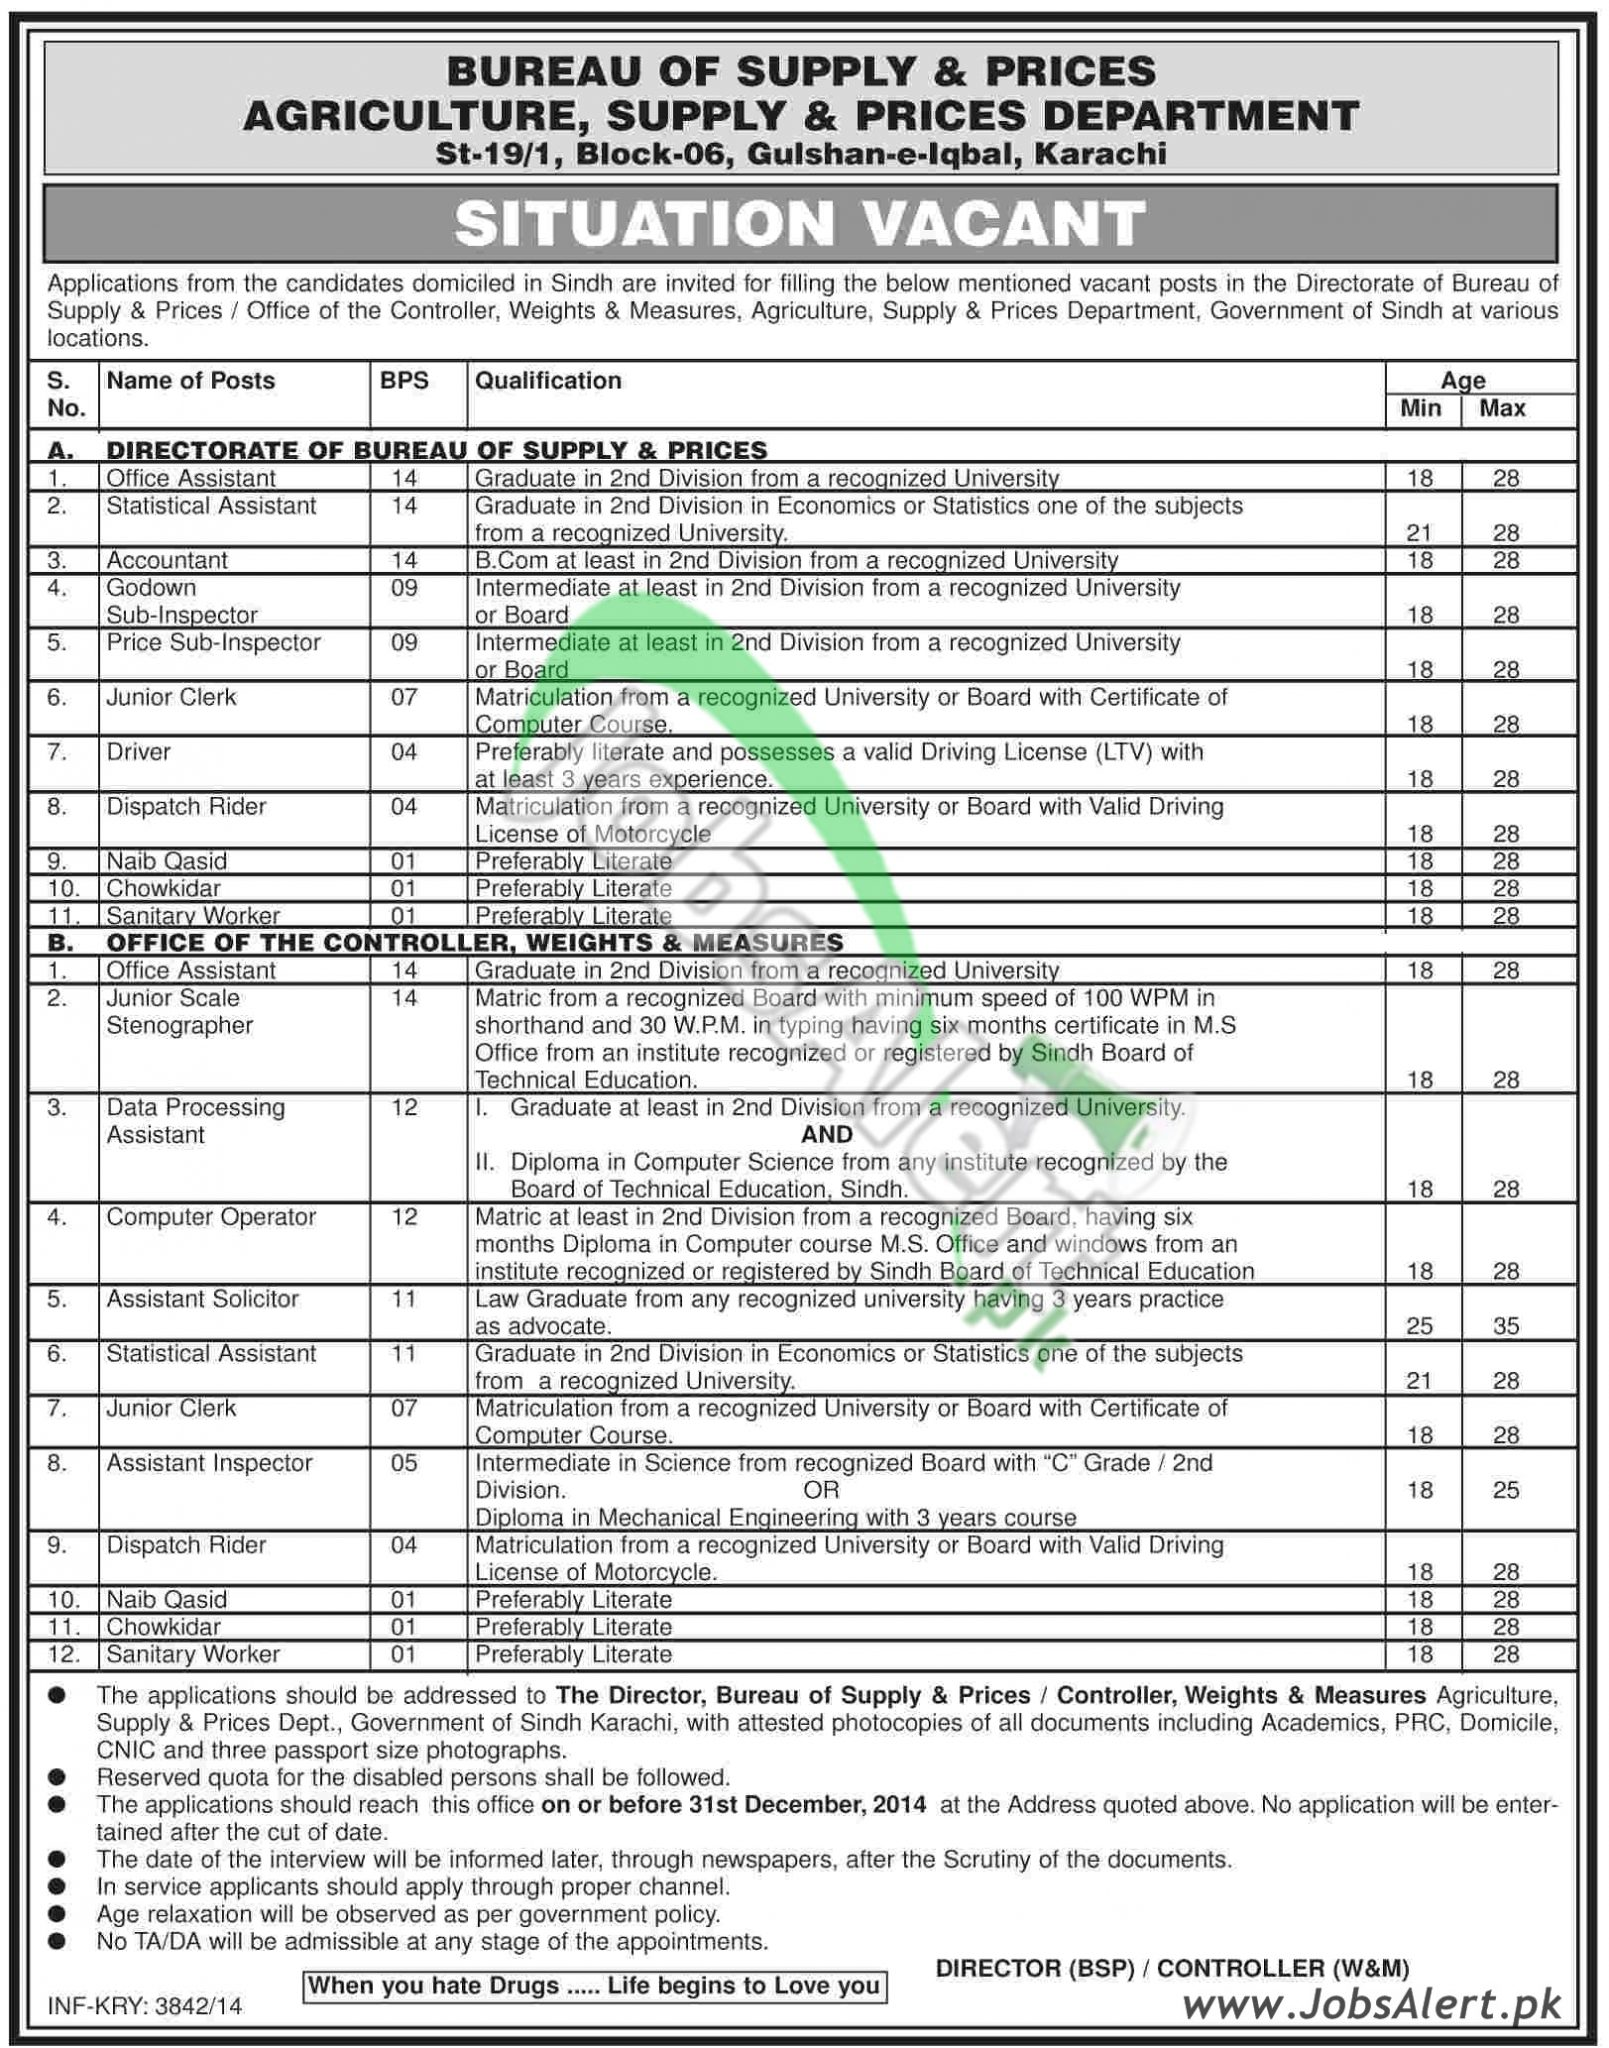 Supply & Prices Department Karachi